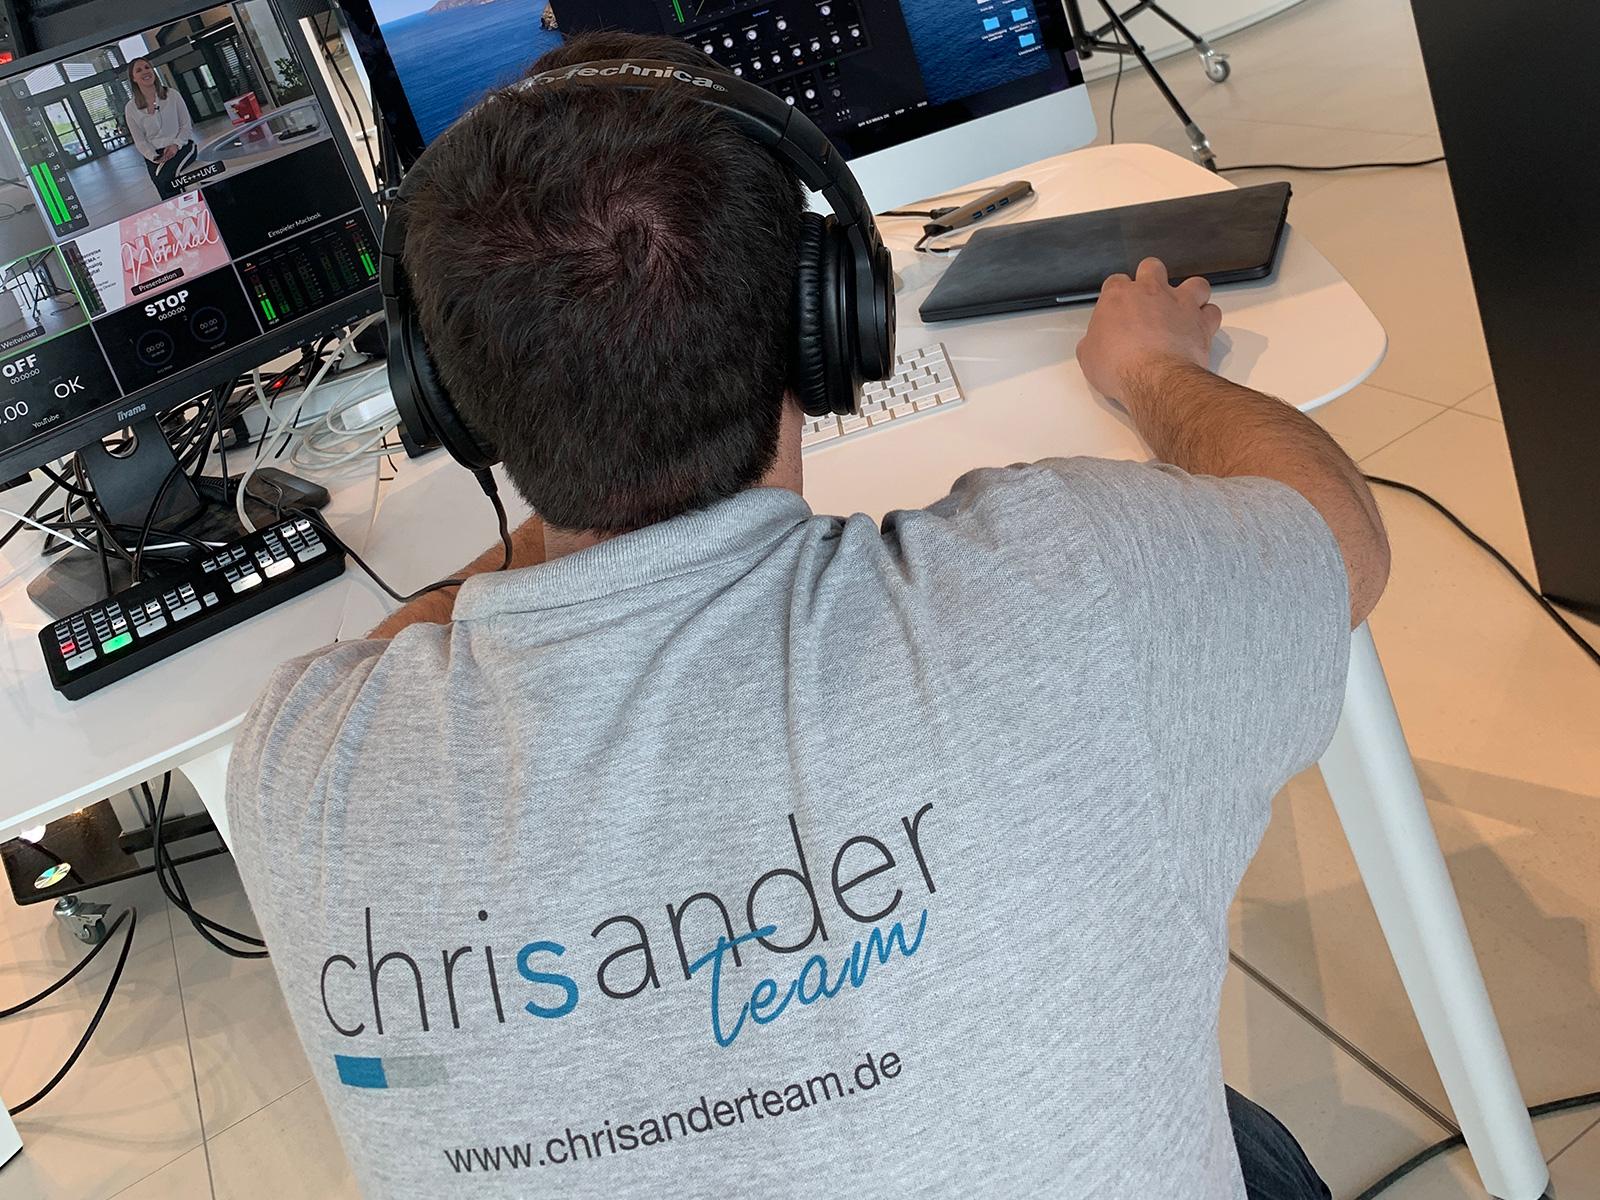 Chrisanderteam-Medien_1600x_4